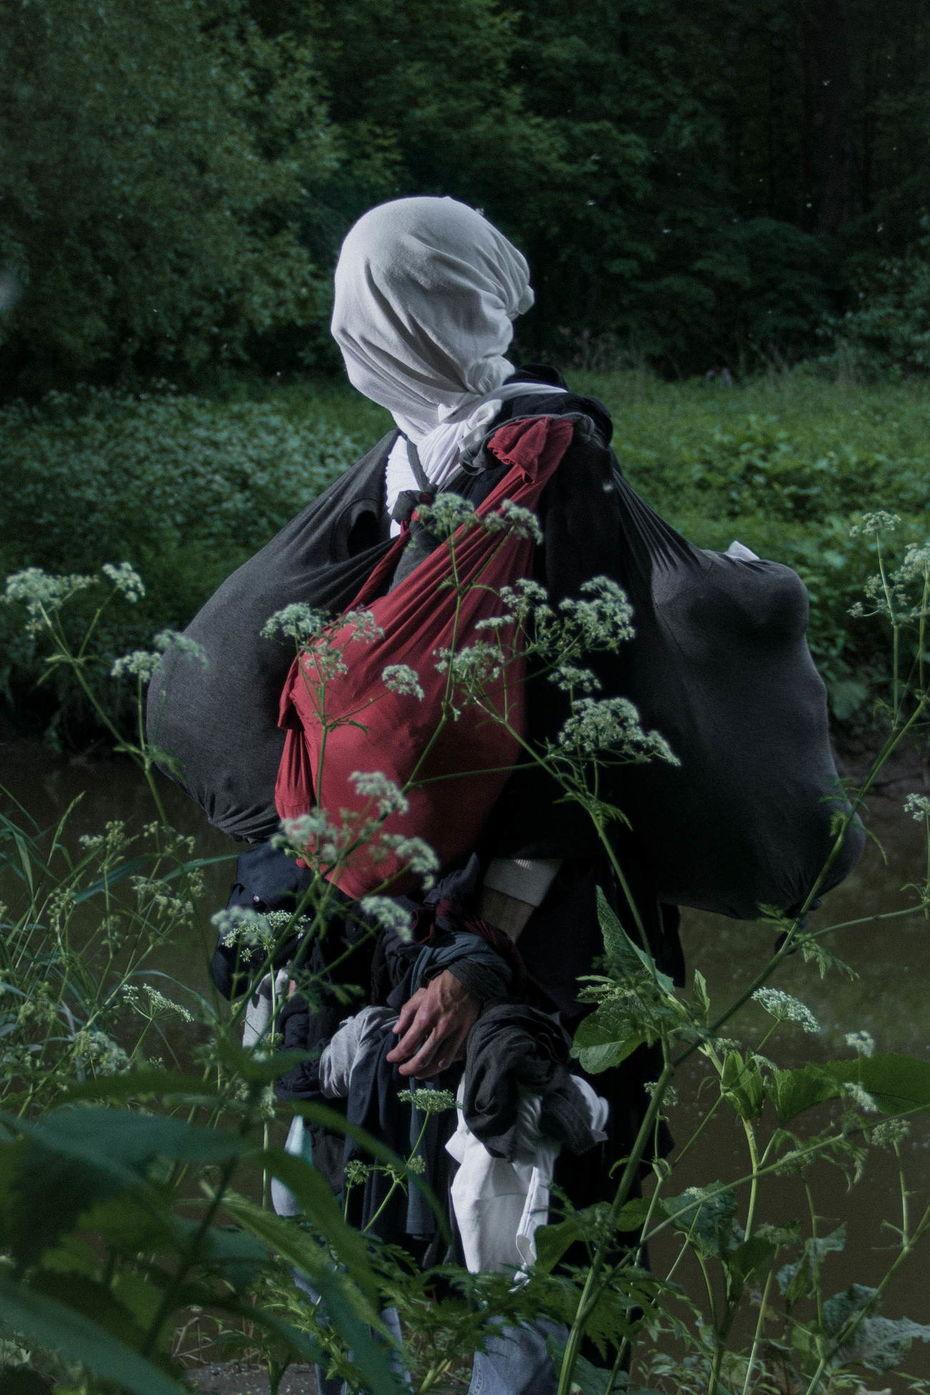 Андрей Вальмус. Slowing down toflowers, 2021